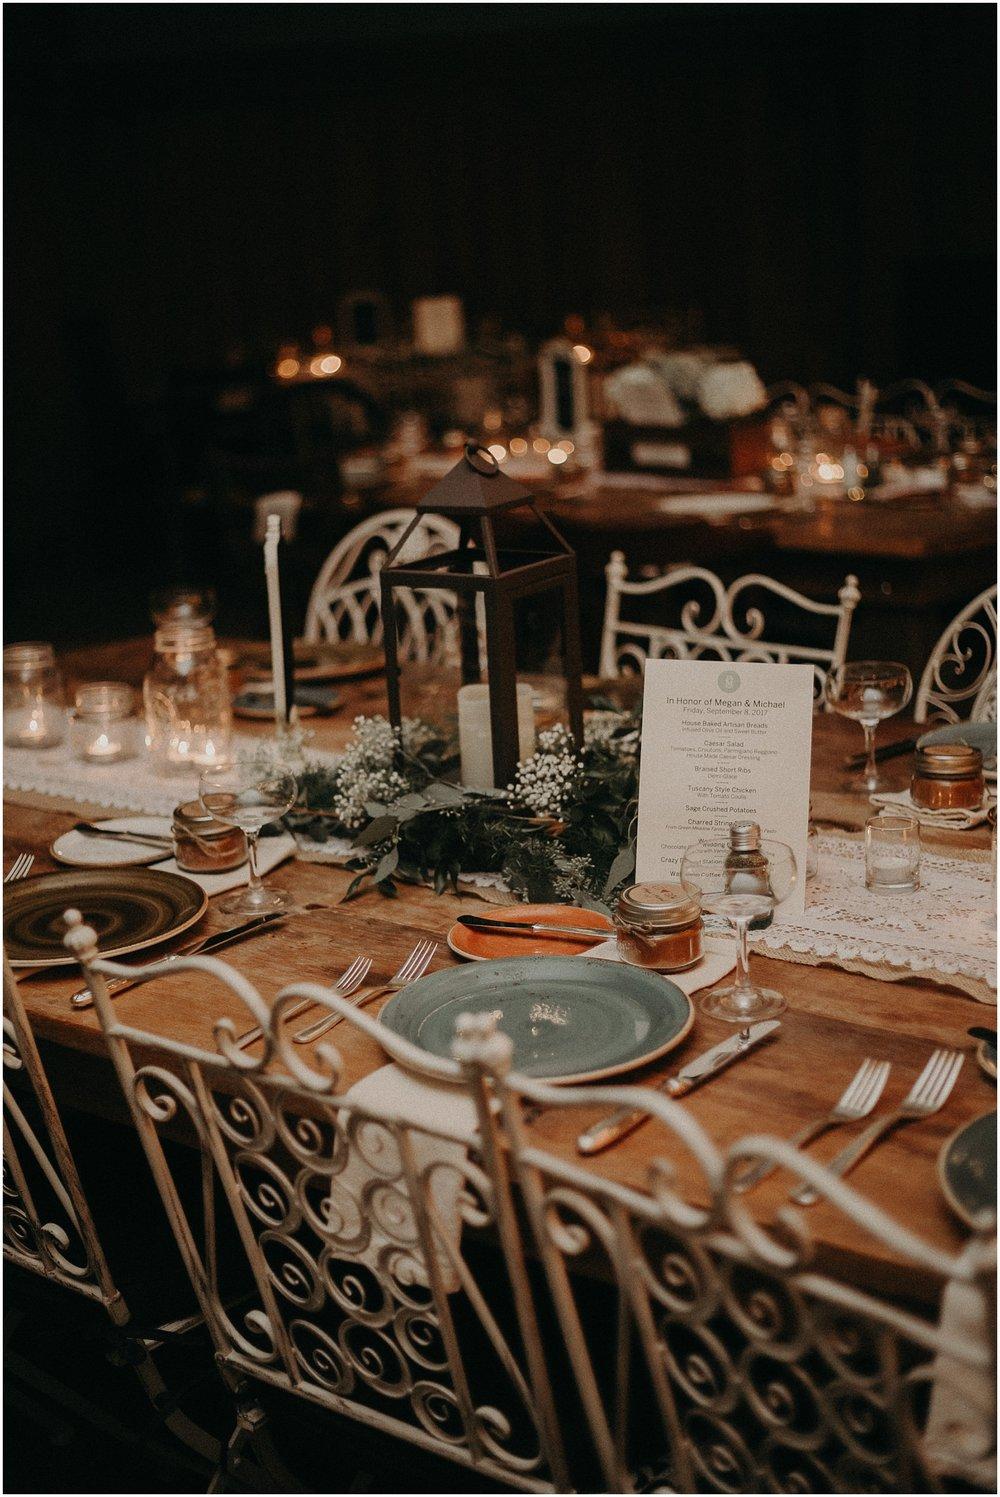 waterloo-village-waterloo village-wedding-outdoor wedding-rustic-boemian-new jersey-bride-groom-wedding party-davids bridal-wedding dress-wedding-first kiss-intimate wedding_0390.jpg